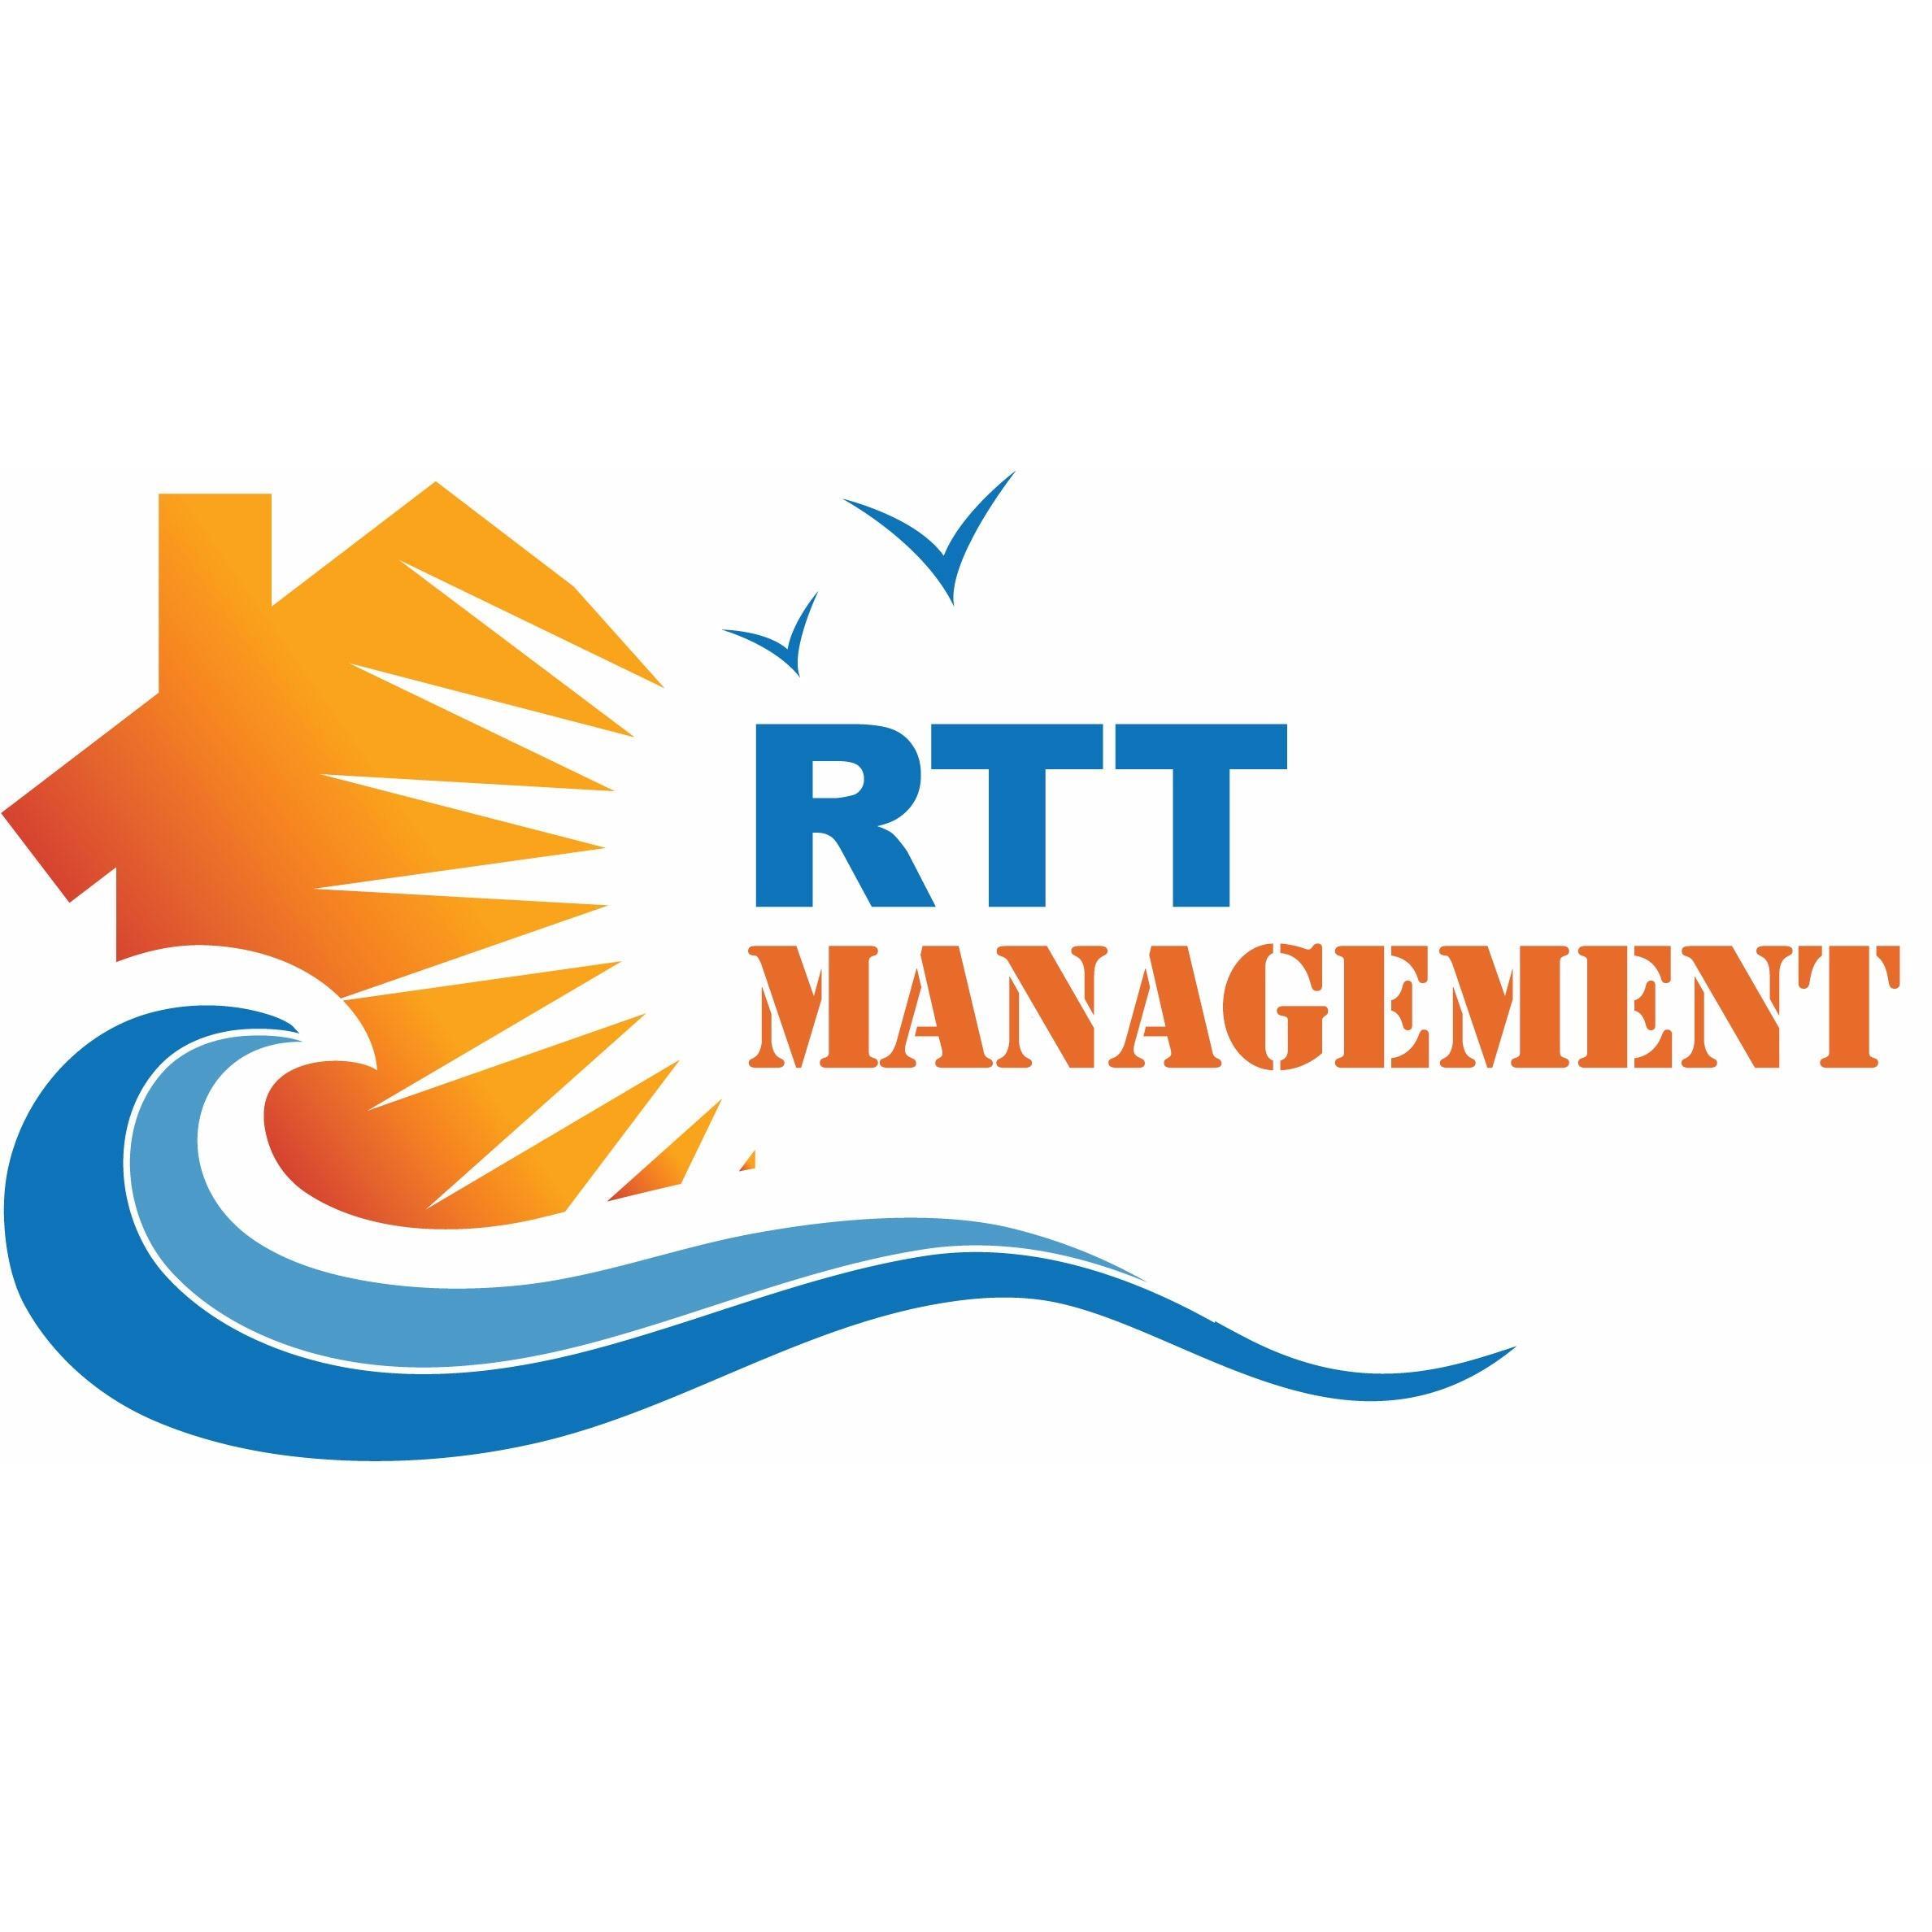 RTT Management